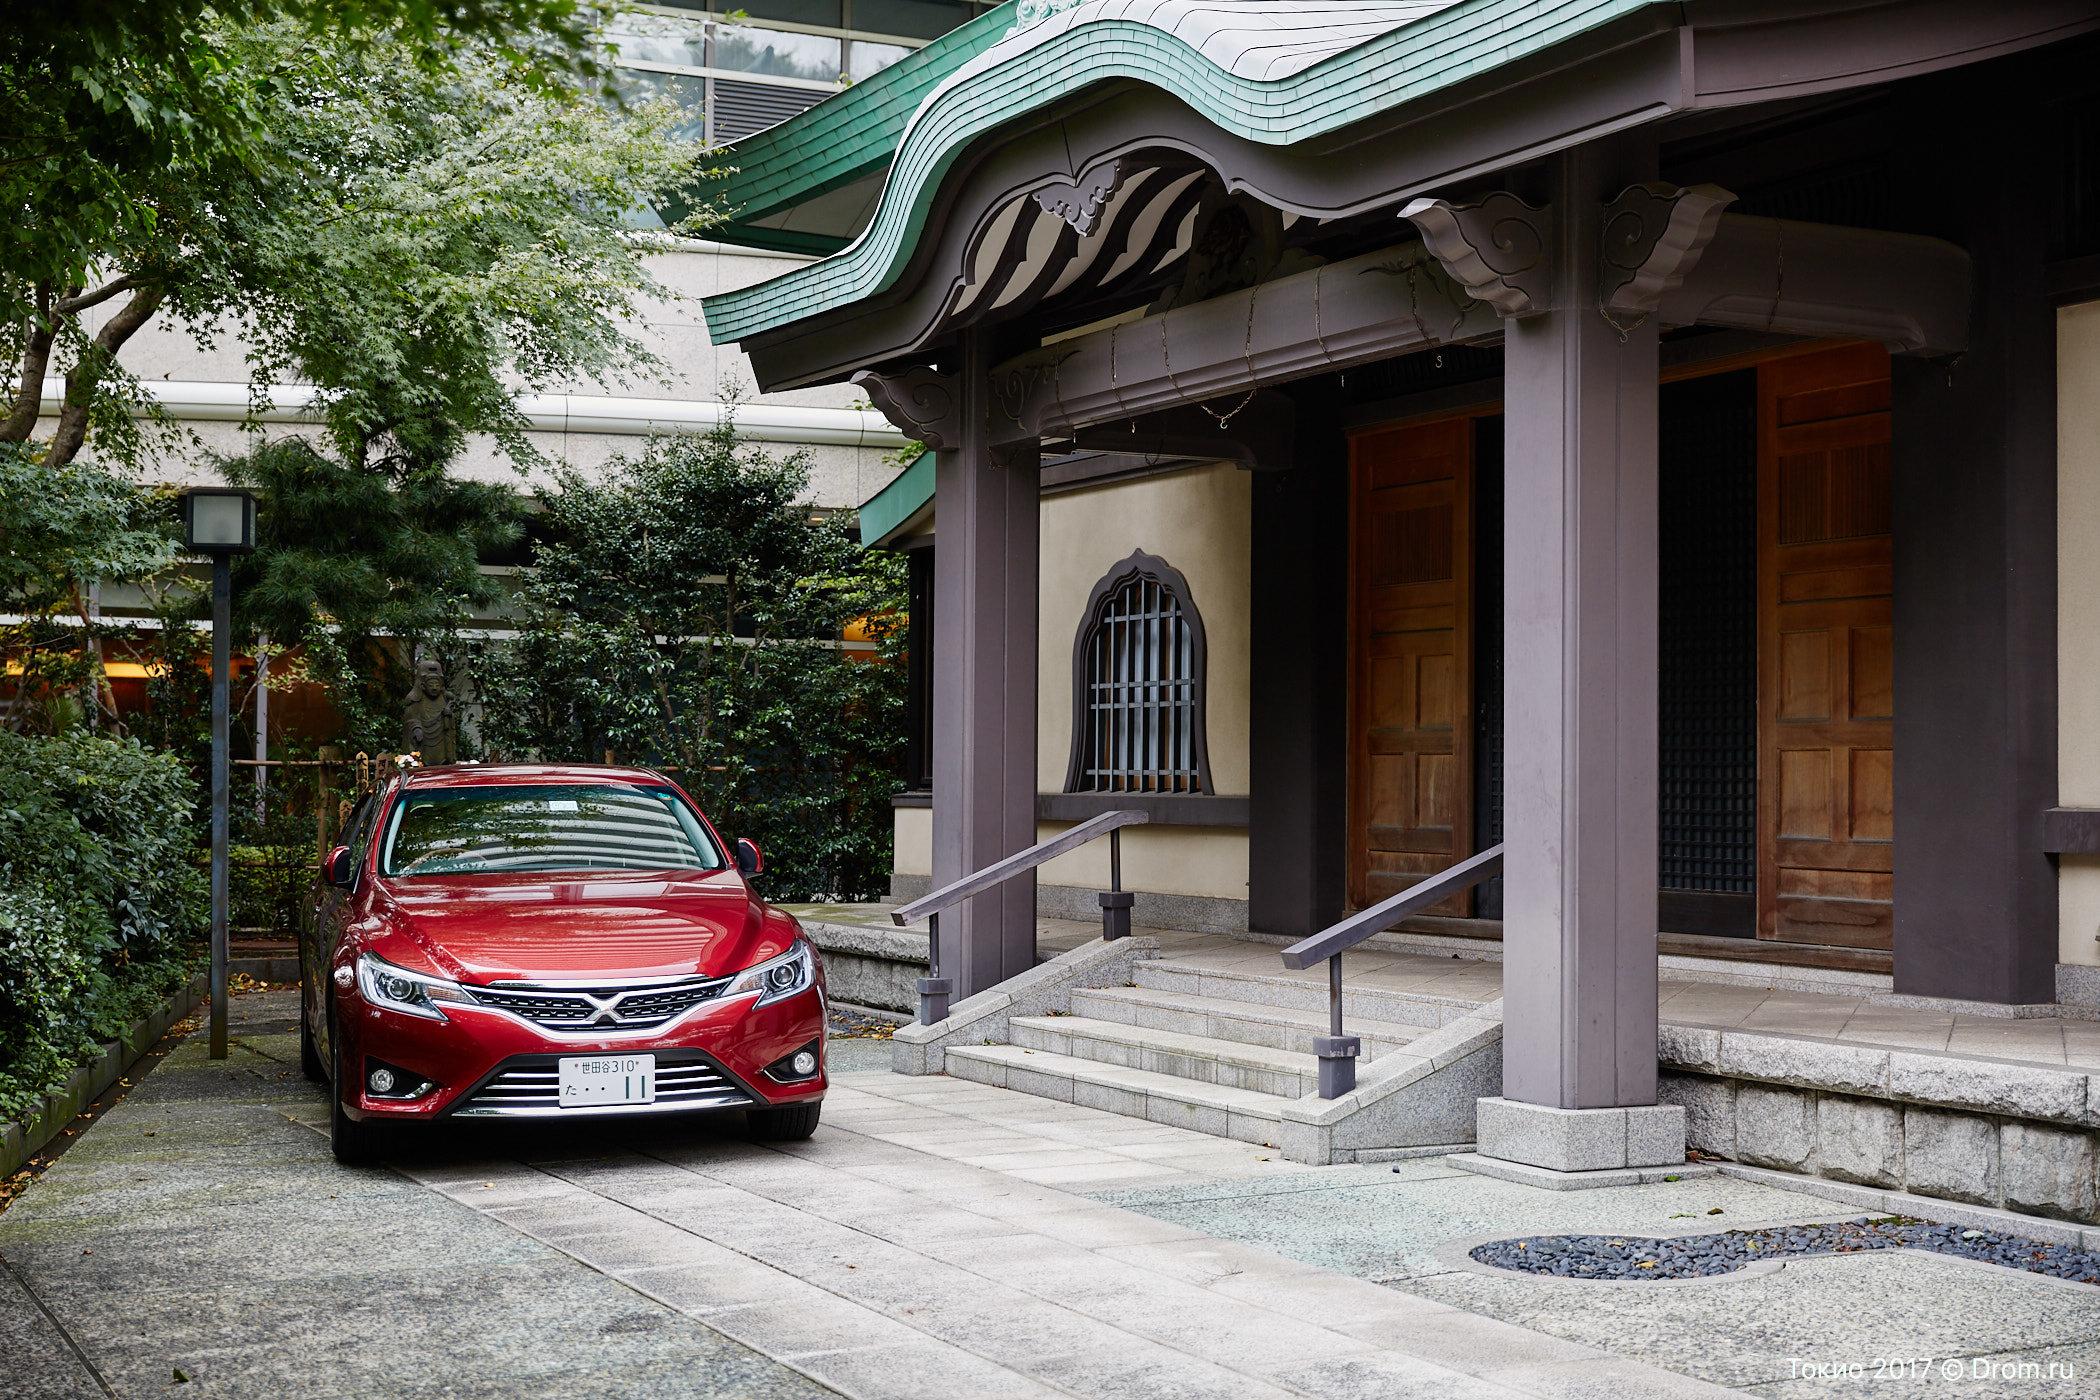 Токийский автосалон На чем ездят японцы Фотографии с улиц  toyota mark x